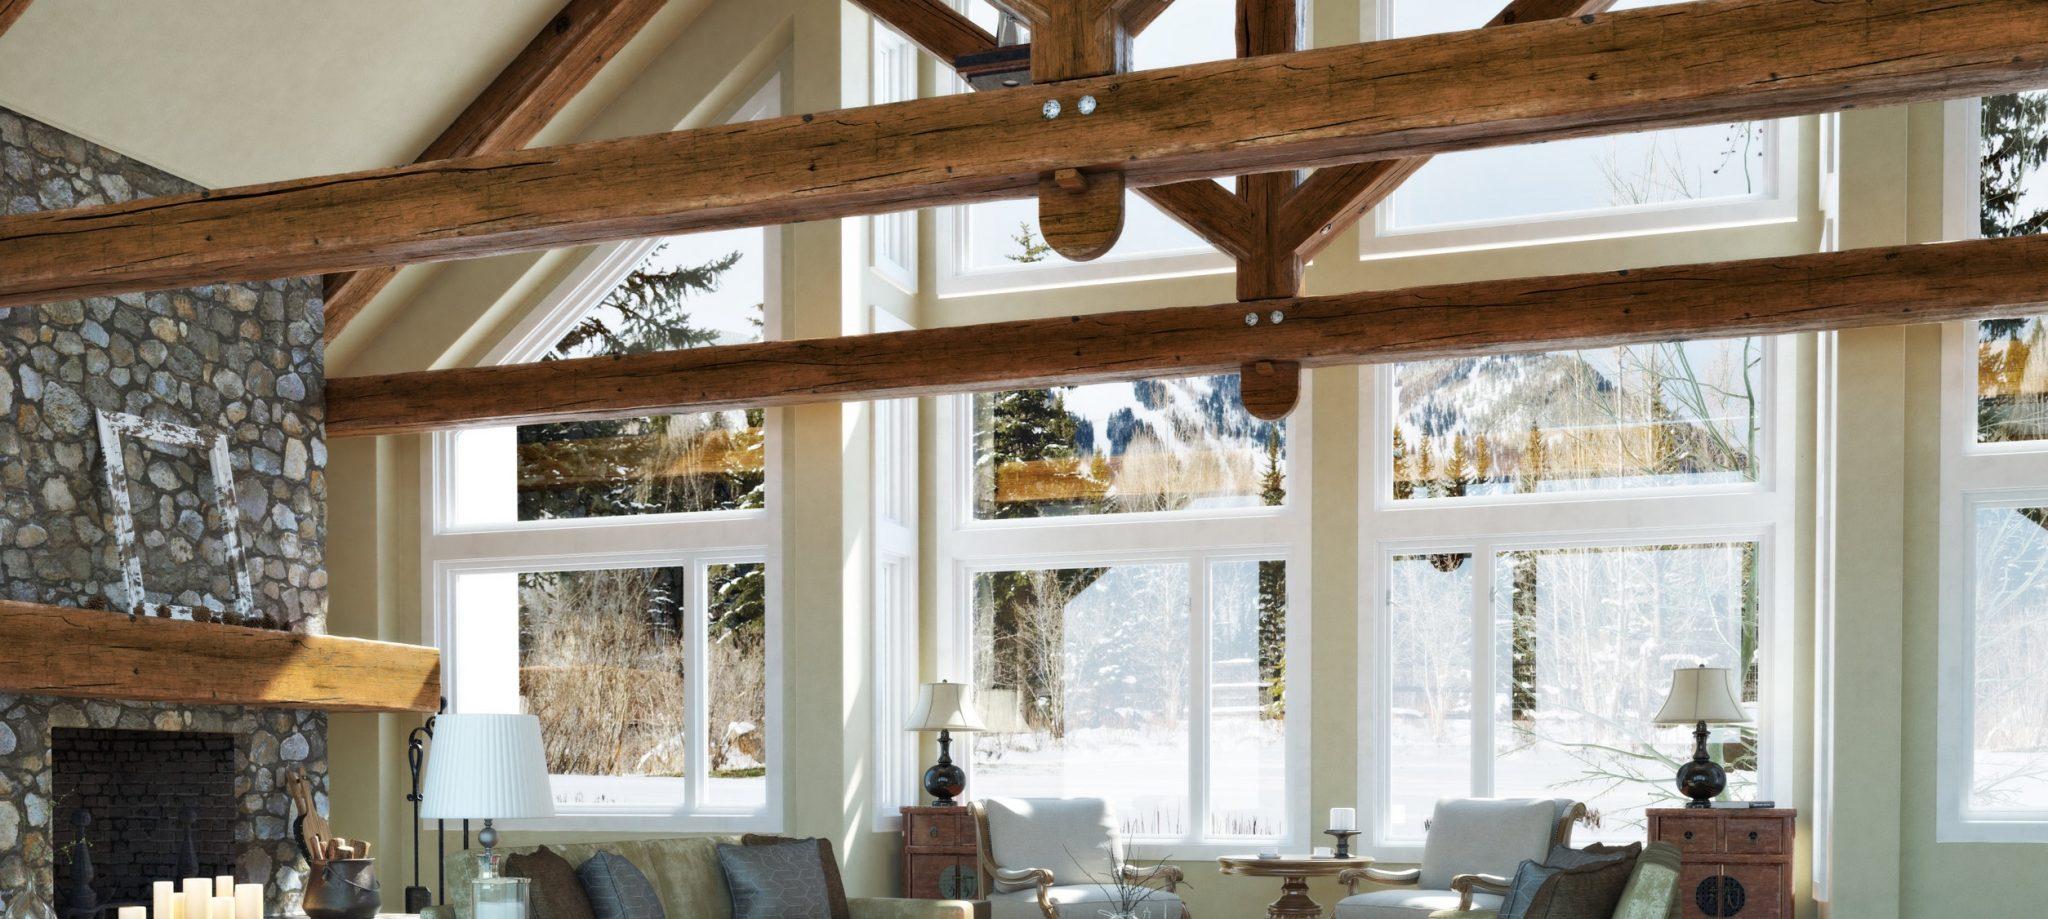 Luxurious open floor cabin interior family room